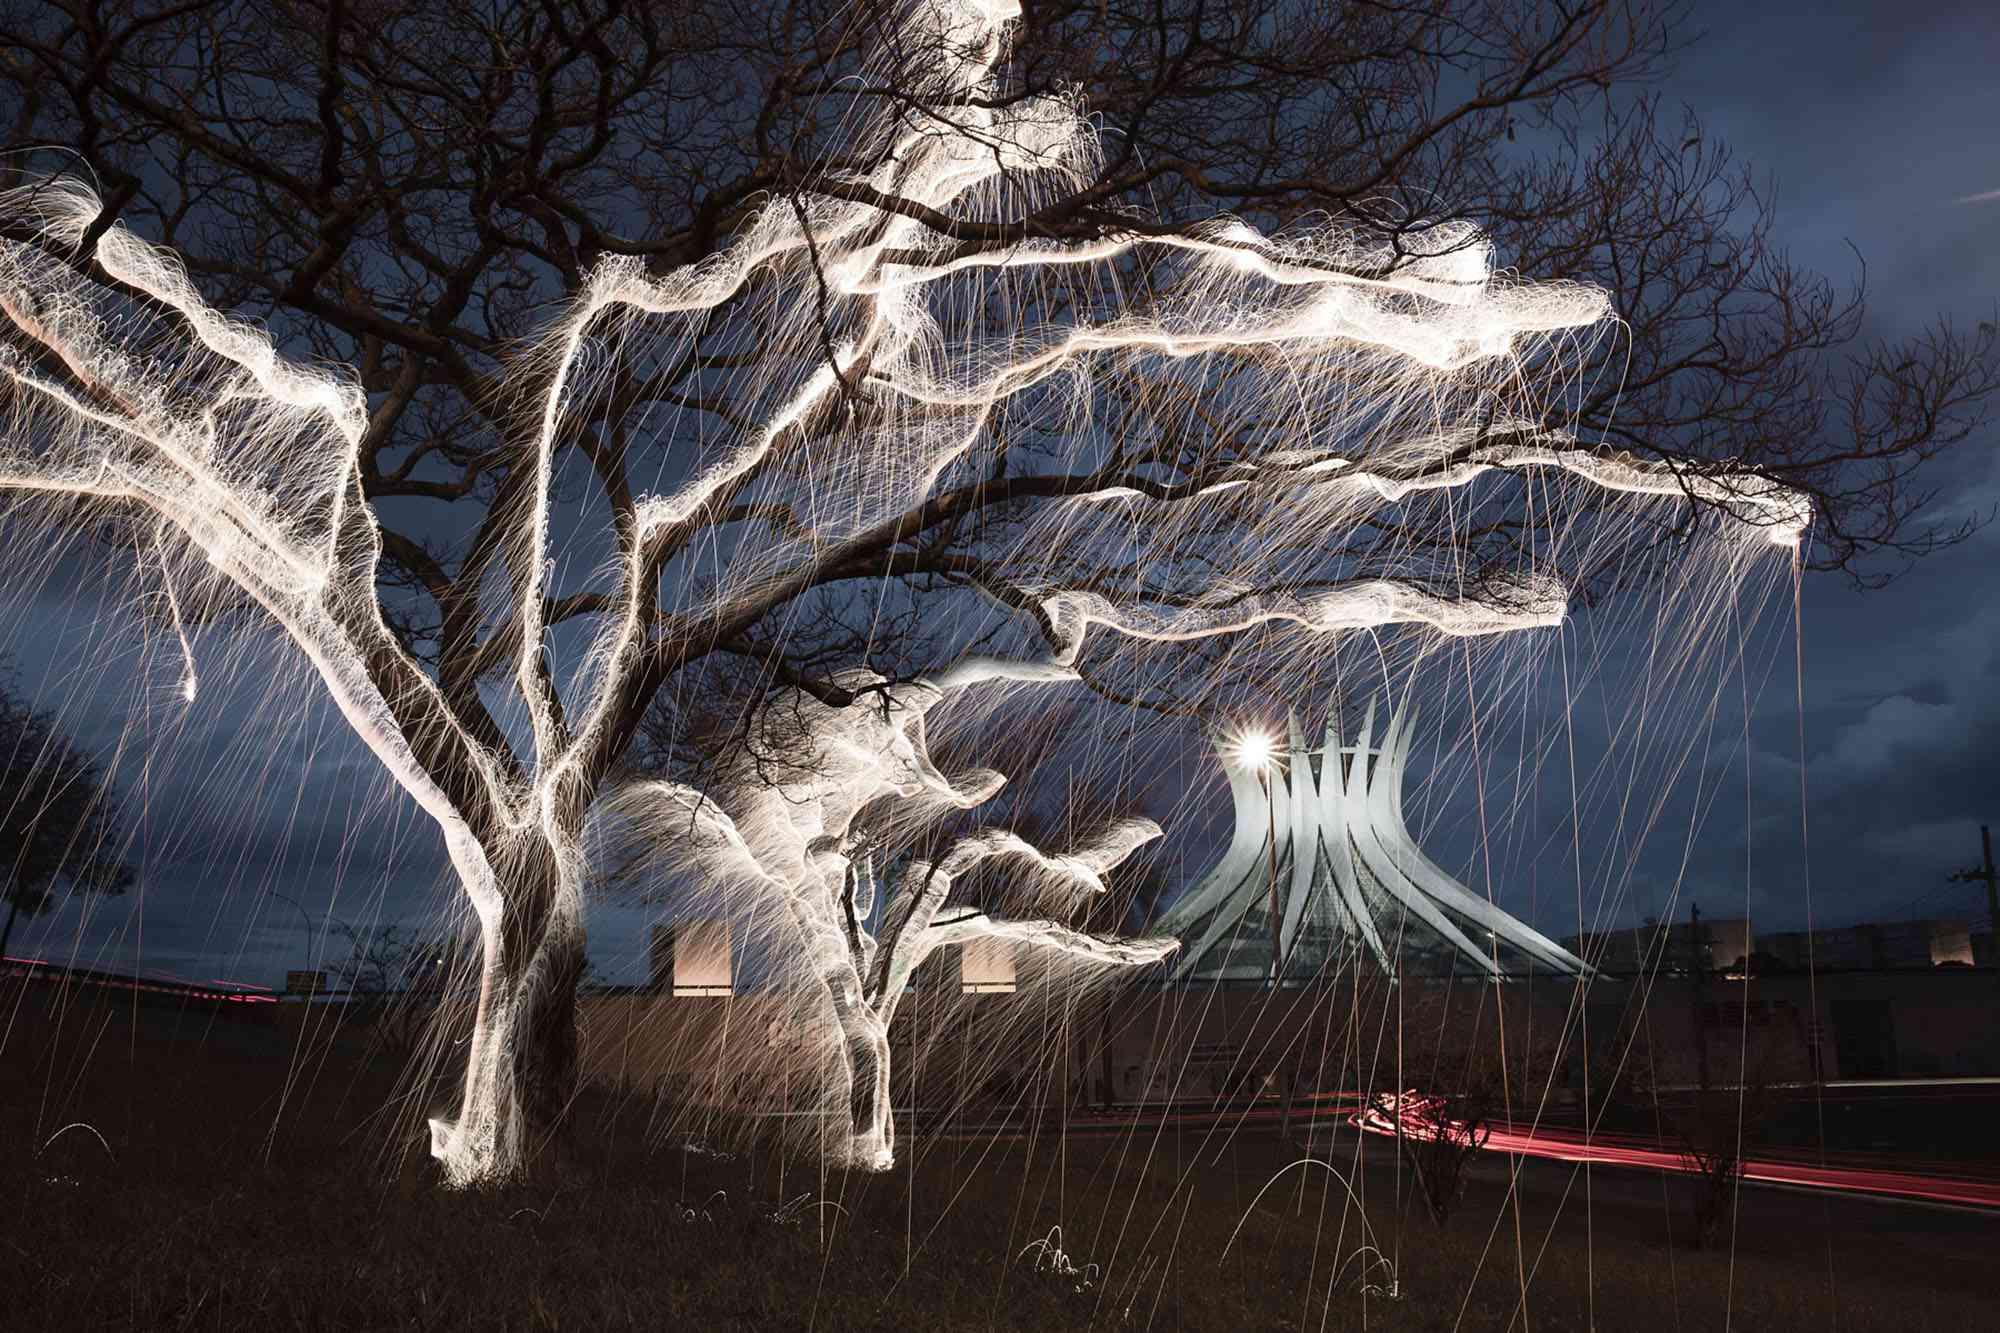 Impermanent Structures light painted trees photographs Vitor Schietti Brasilia